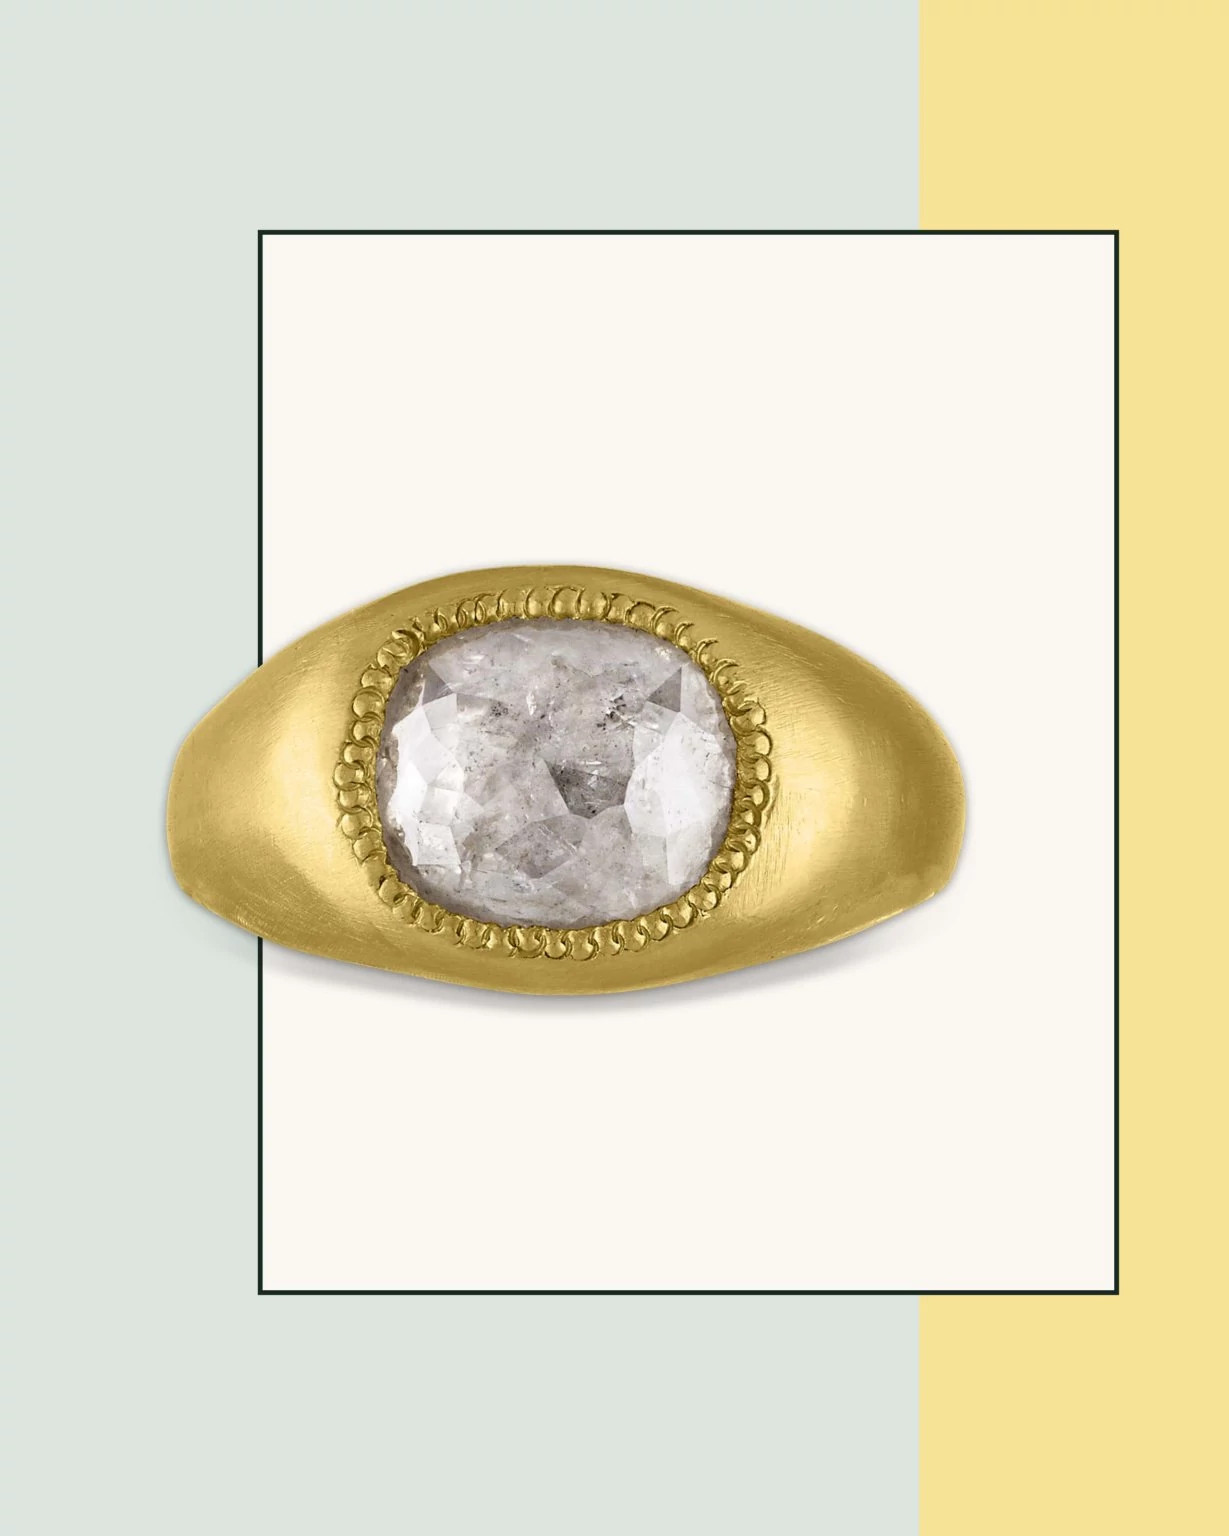 Jean Prounis的天然钻石作品